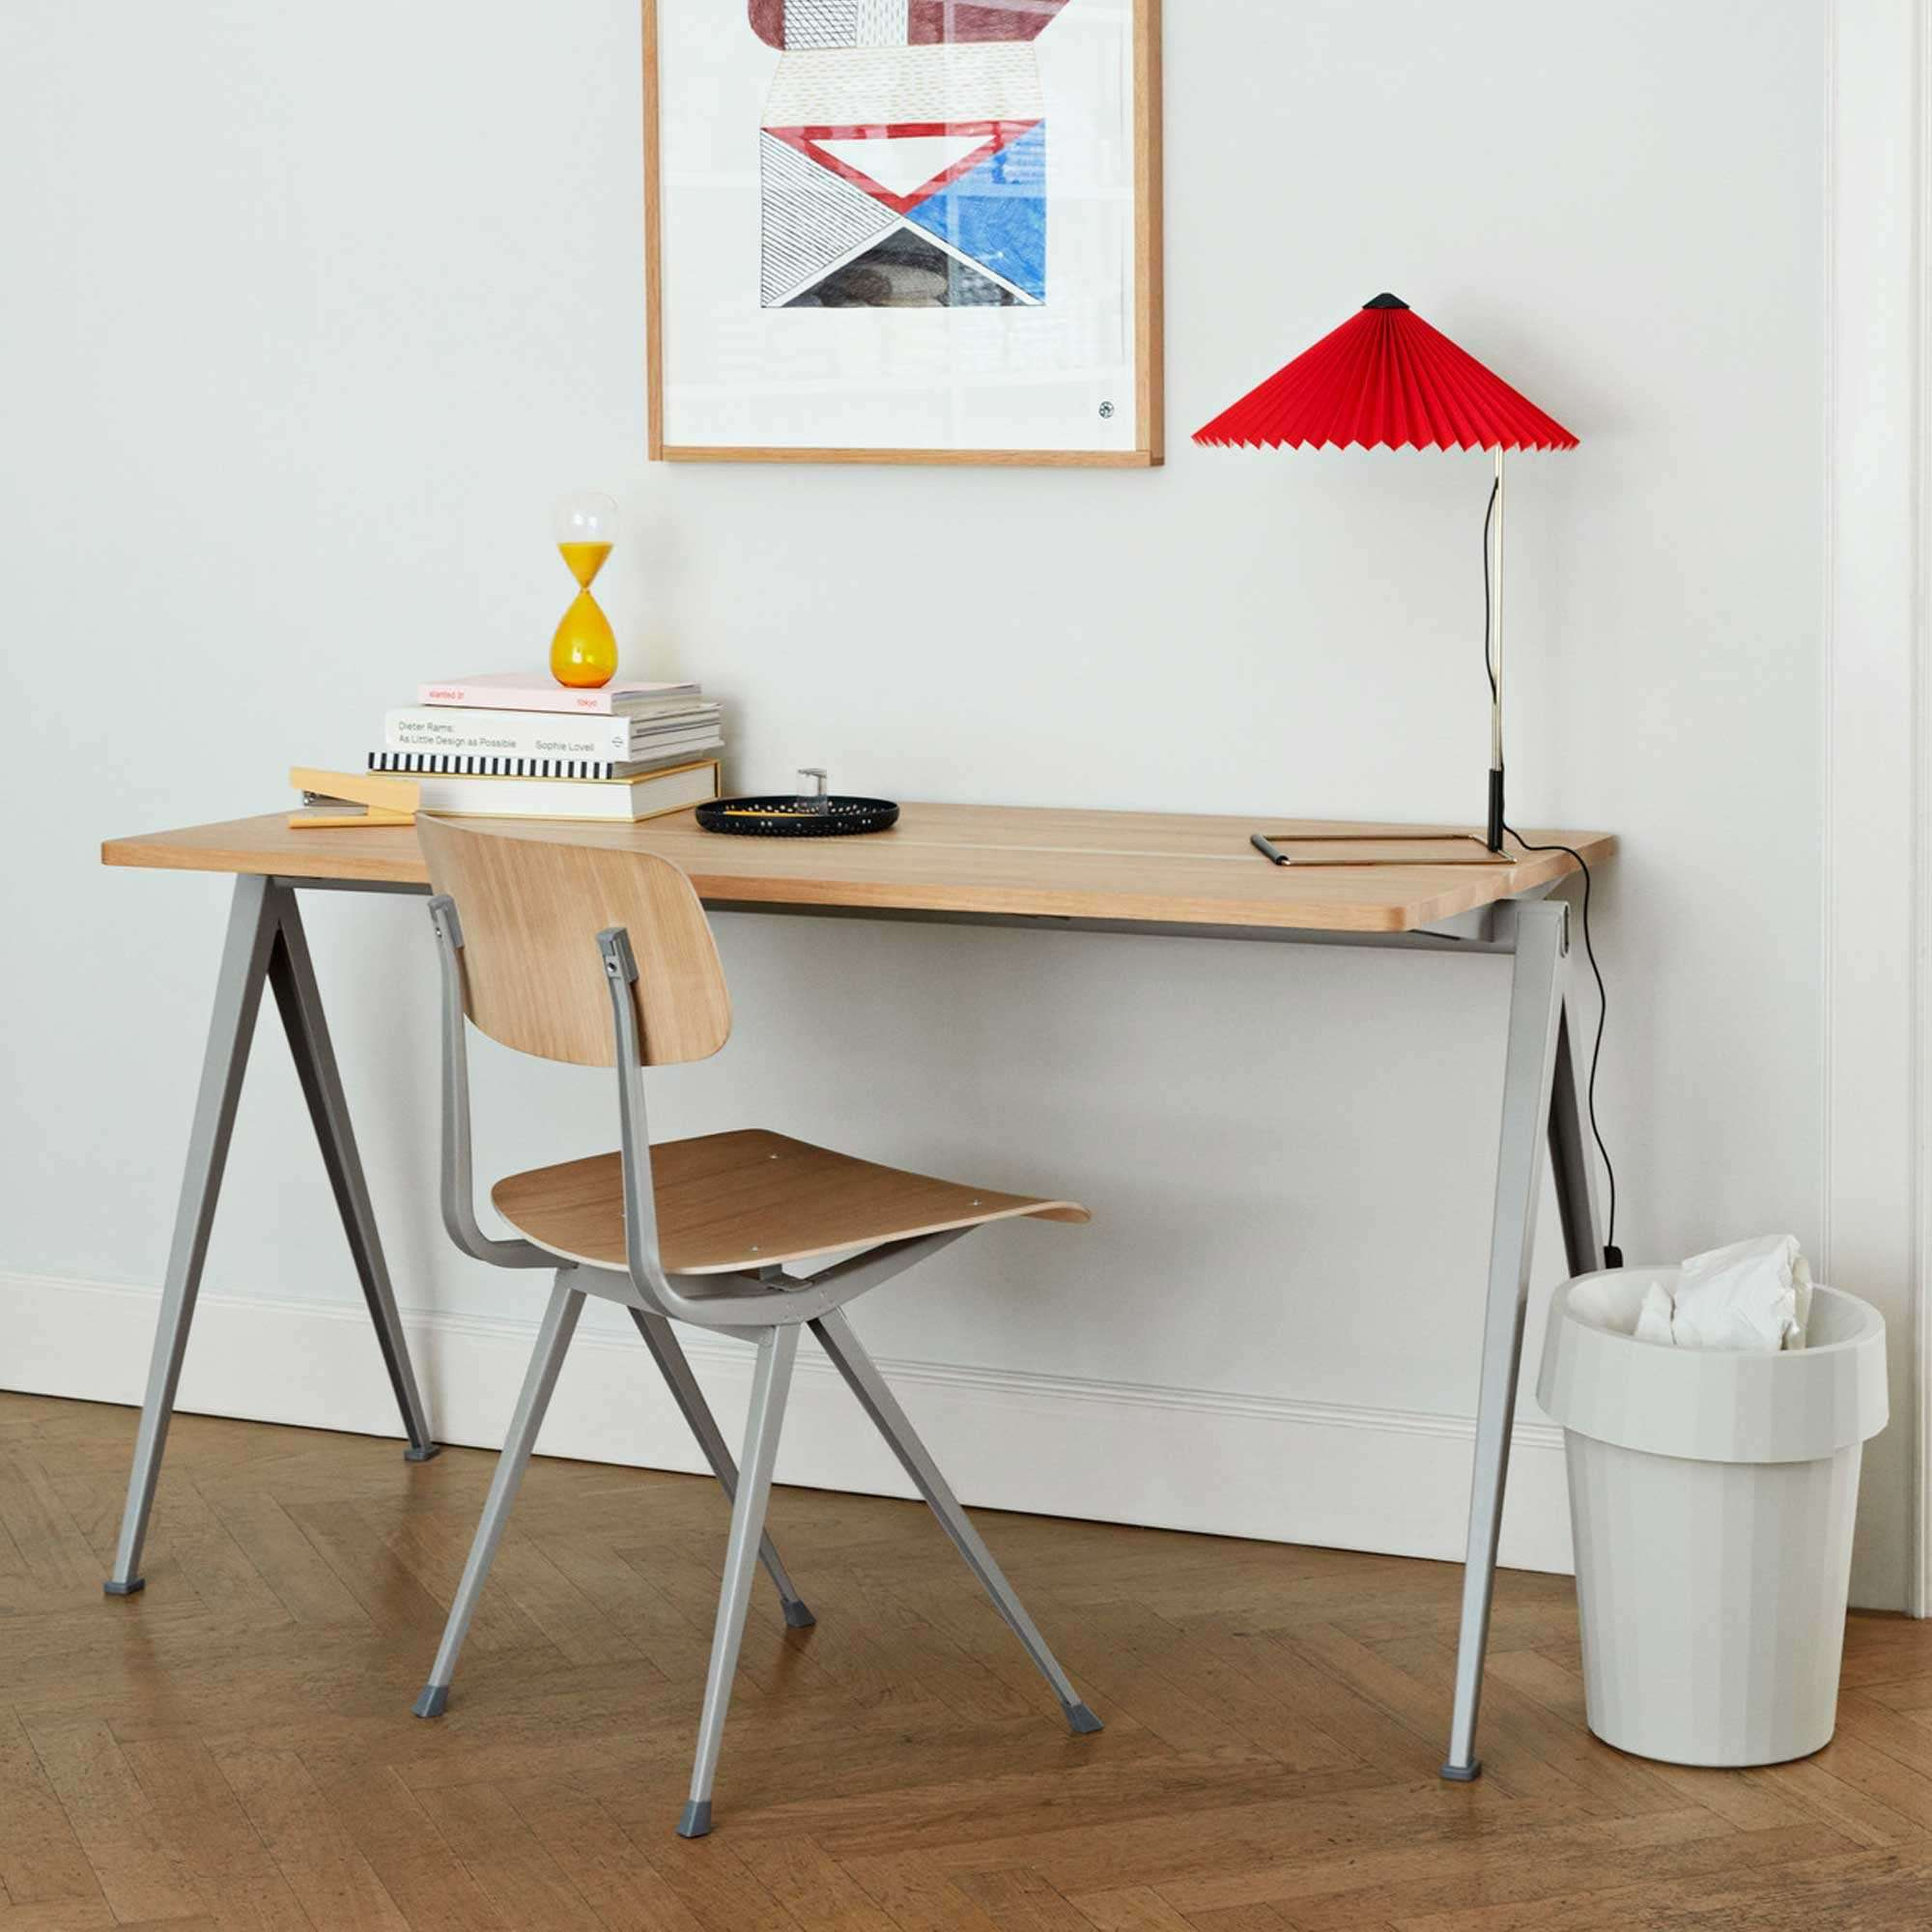 Tendance Home & Style / Bureau / Hay